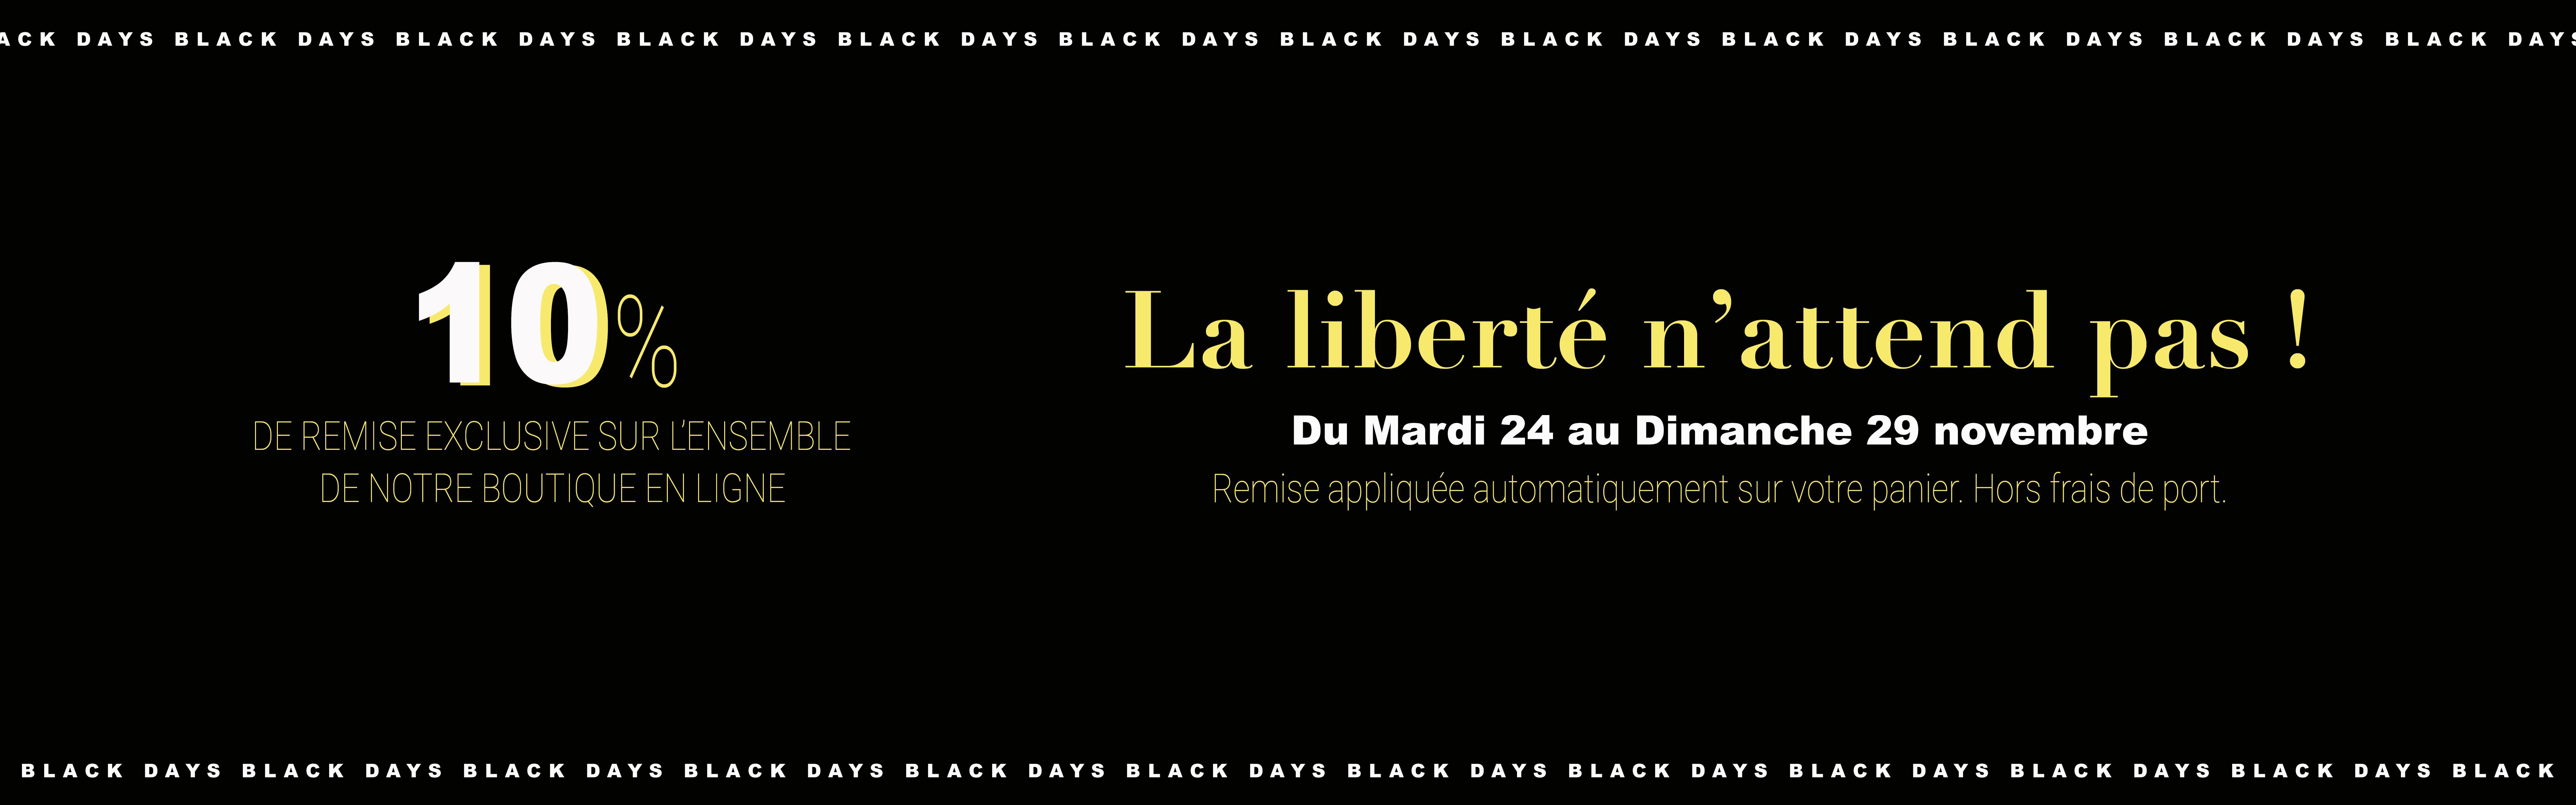 BLACK DAYS 2020